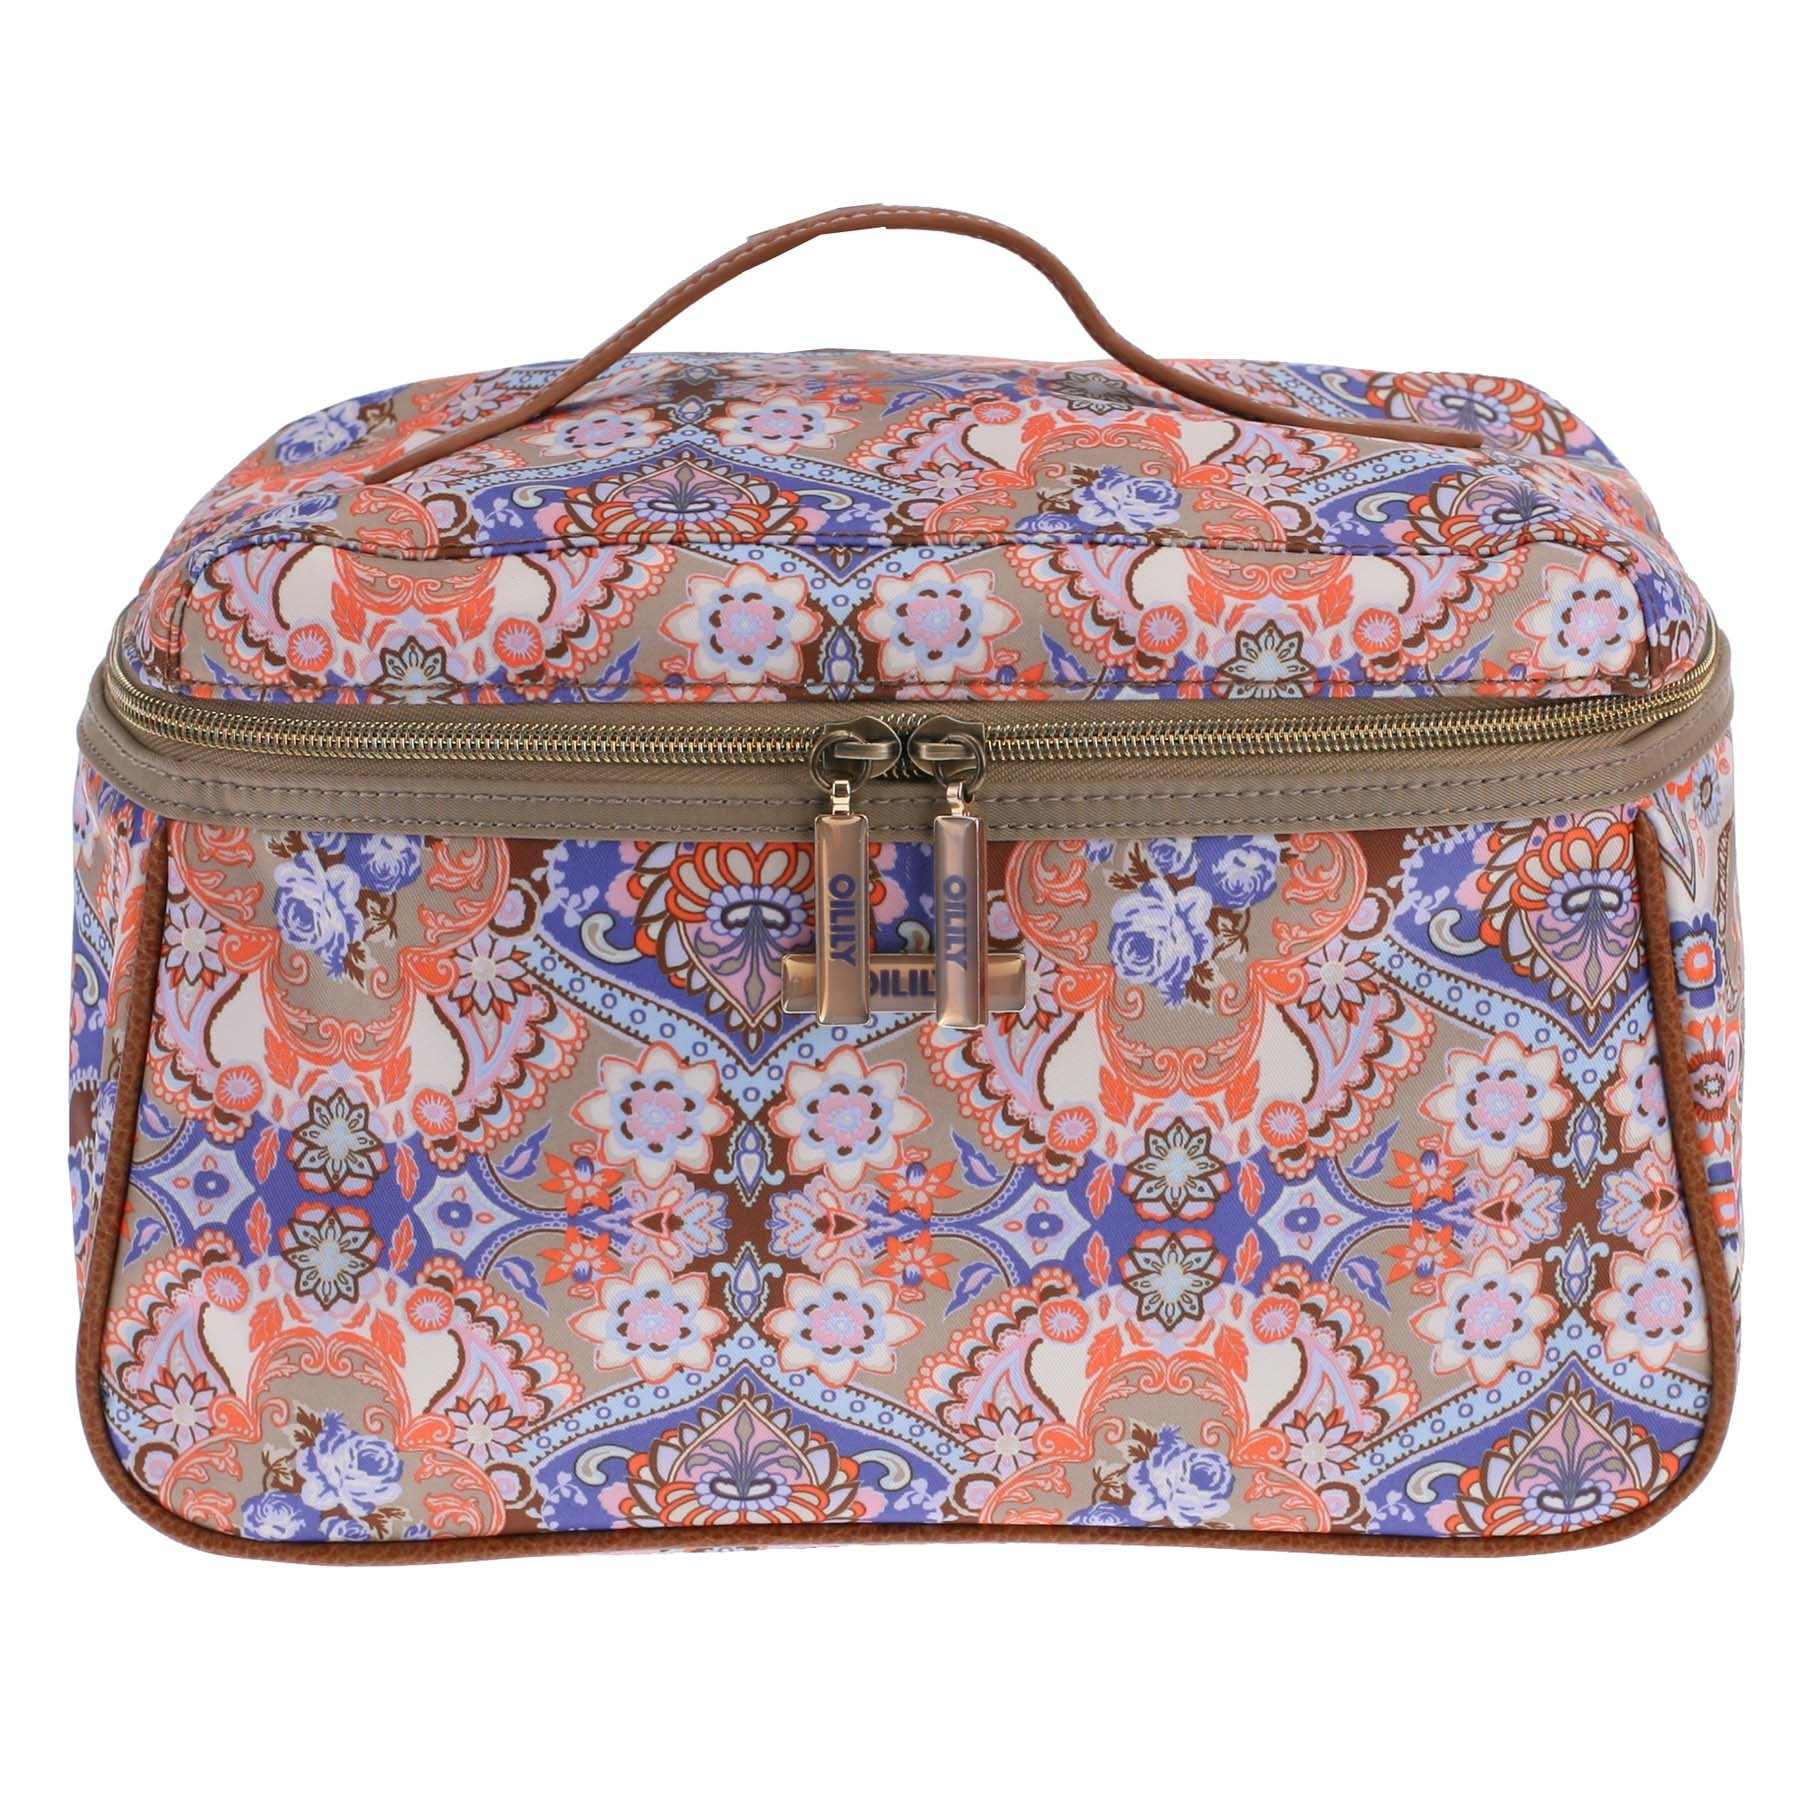 oilily summer mosaic kosmetiktasche l beauty case fig ebay. Black Bedroom Furniture Sets. Home Design Ideas